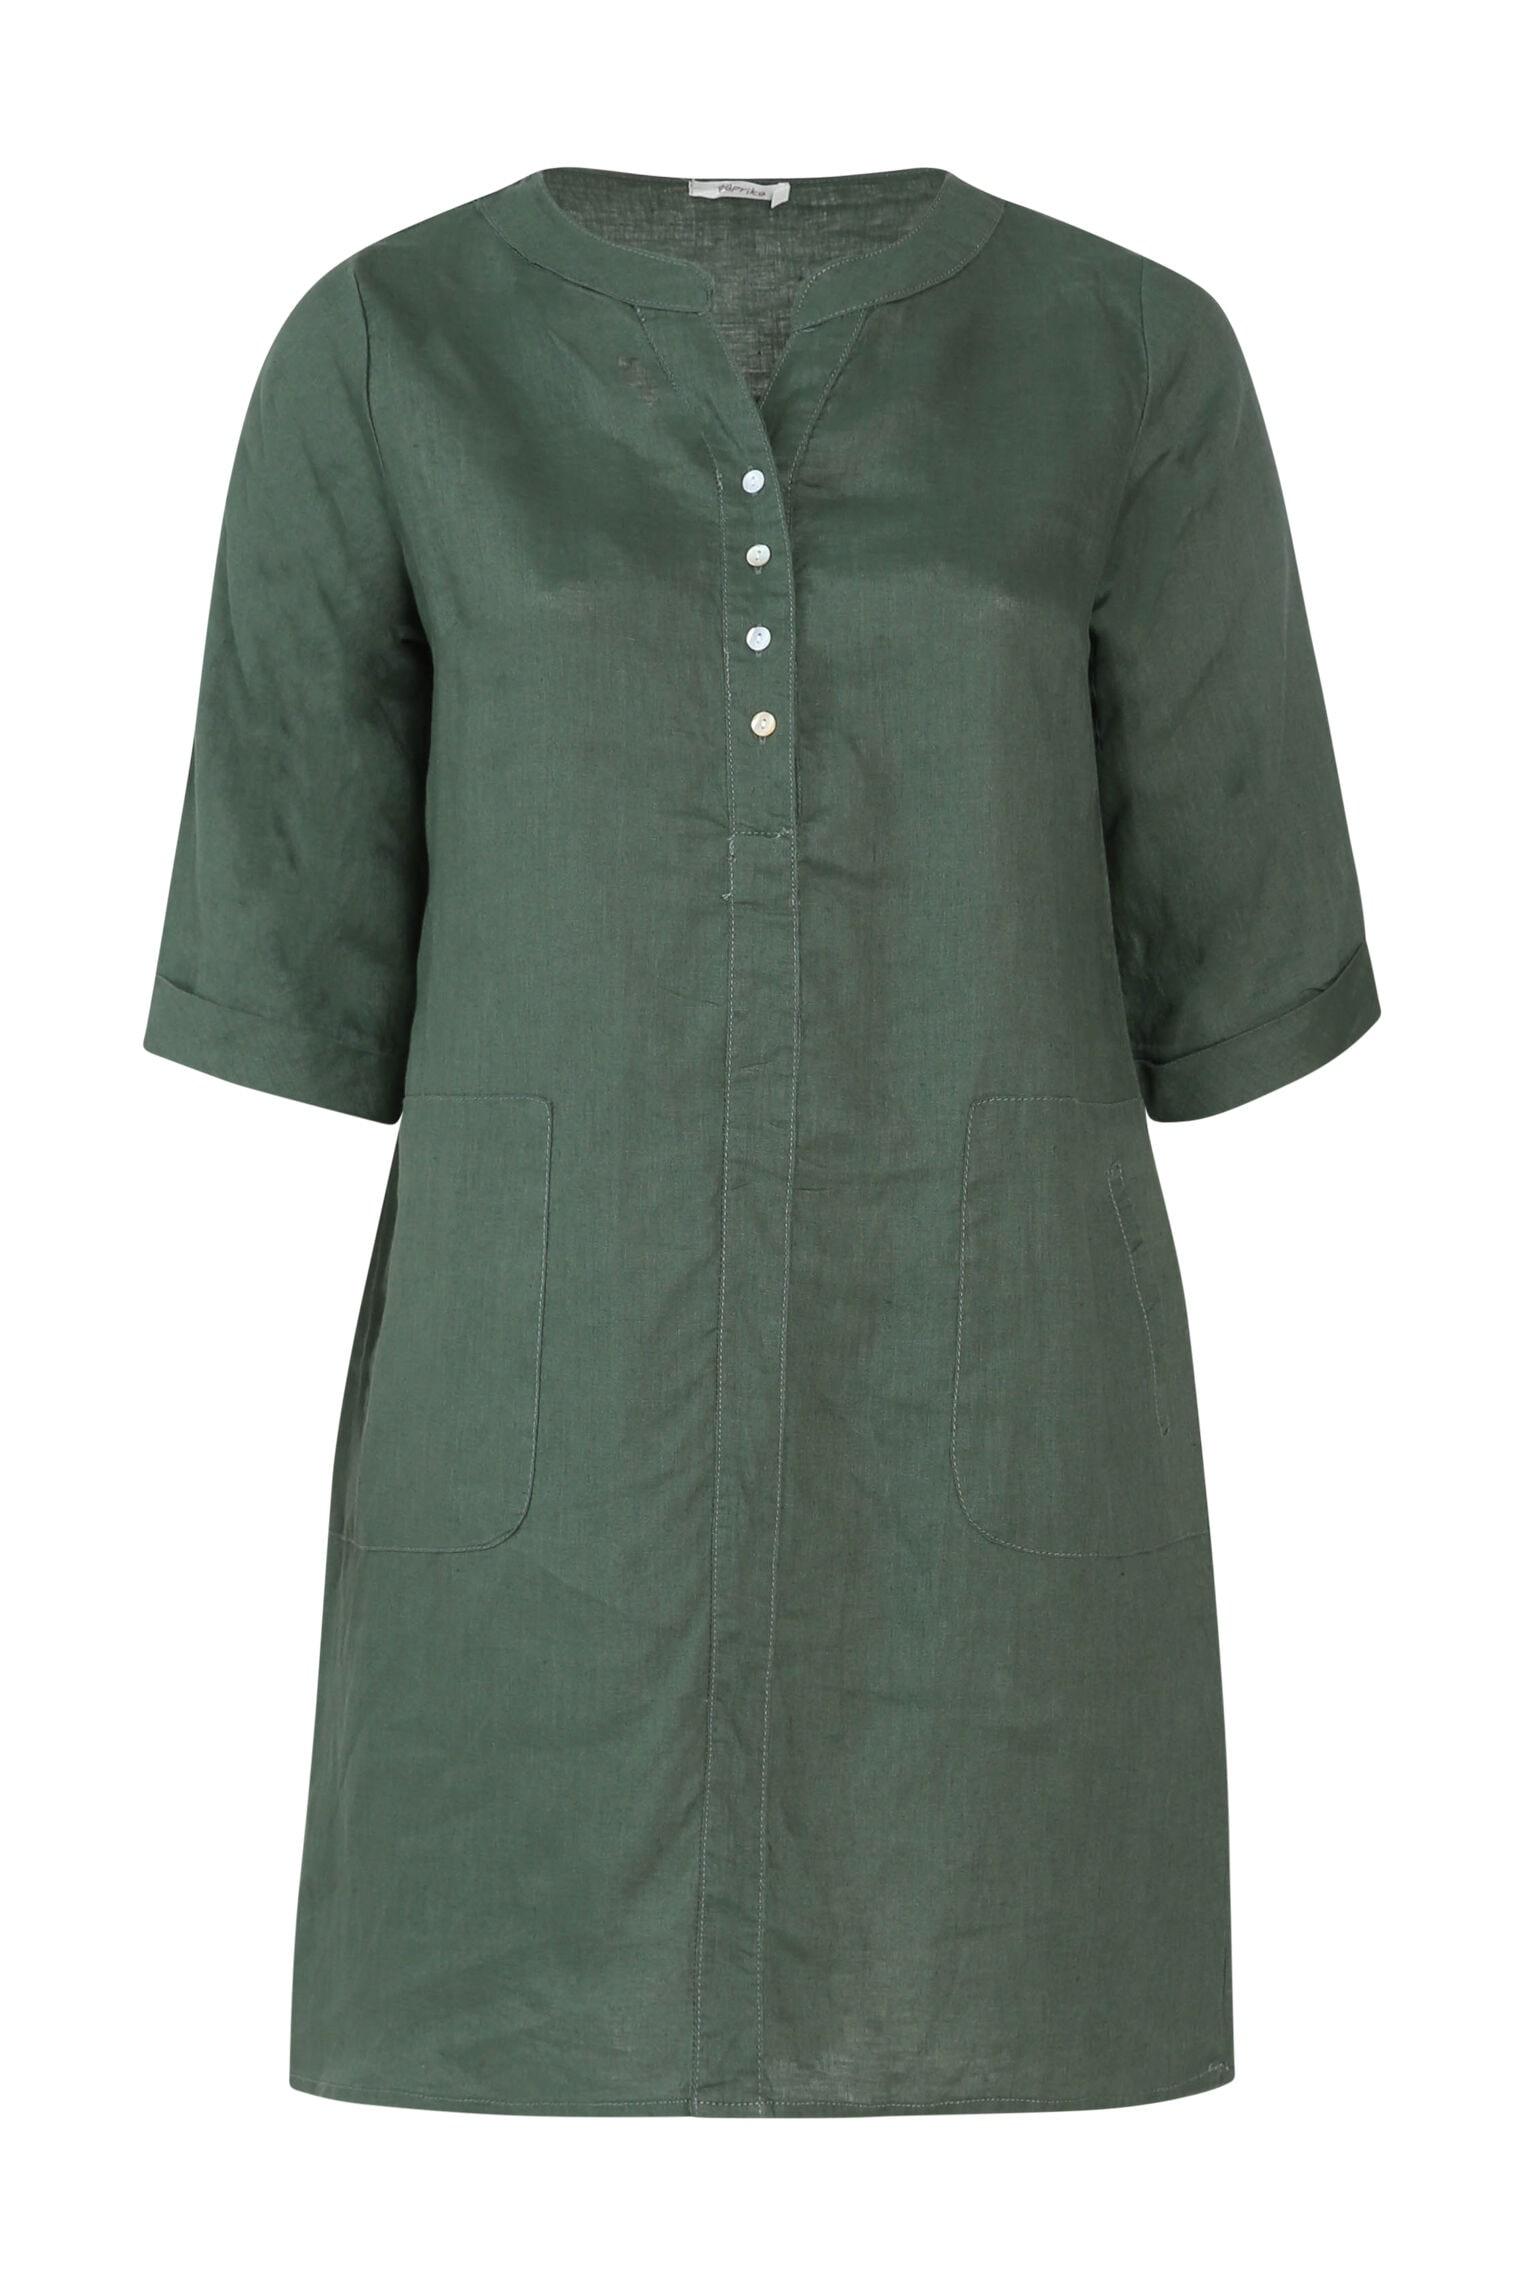 paprika -  Blusenkleid Maokragen Uniform